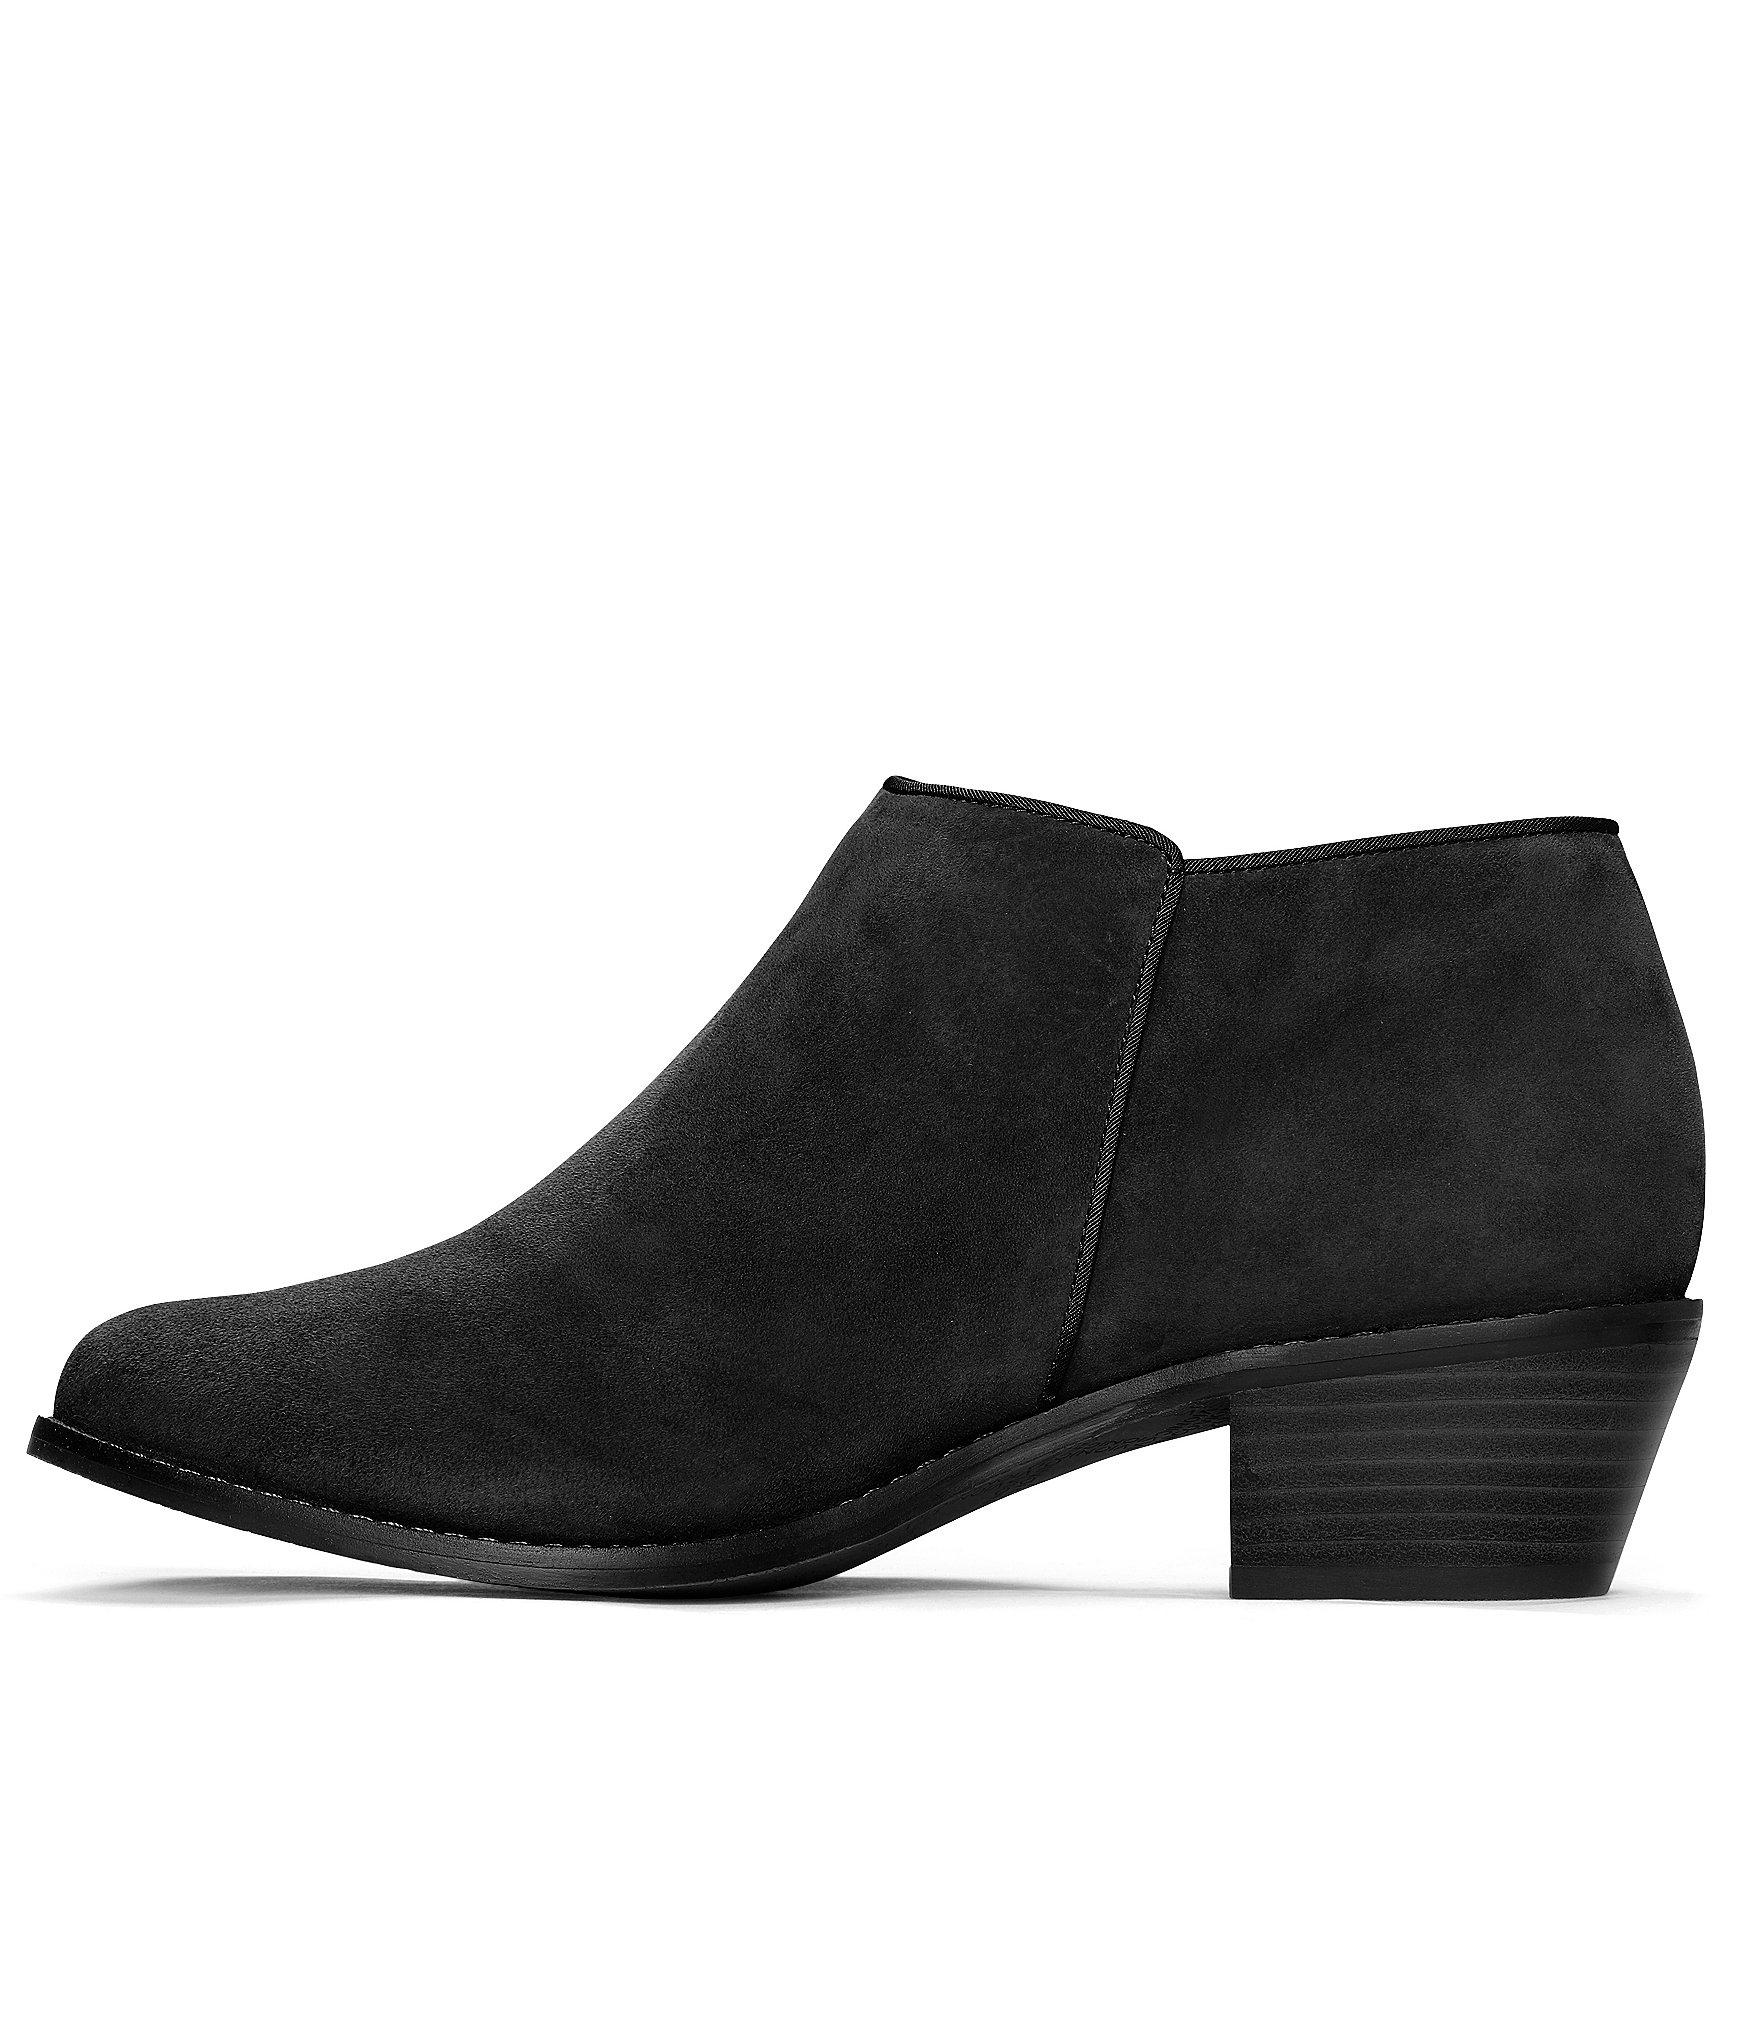 Serena Water Resistant Suede Zipper With Tassel Pull Block Heel Ankle Boots